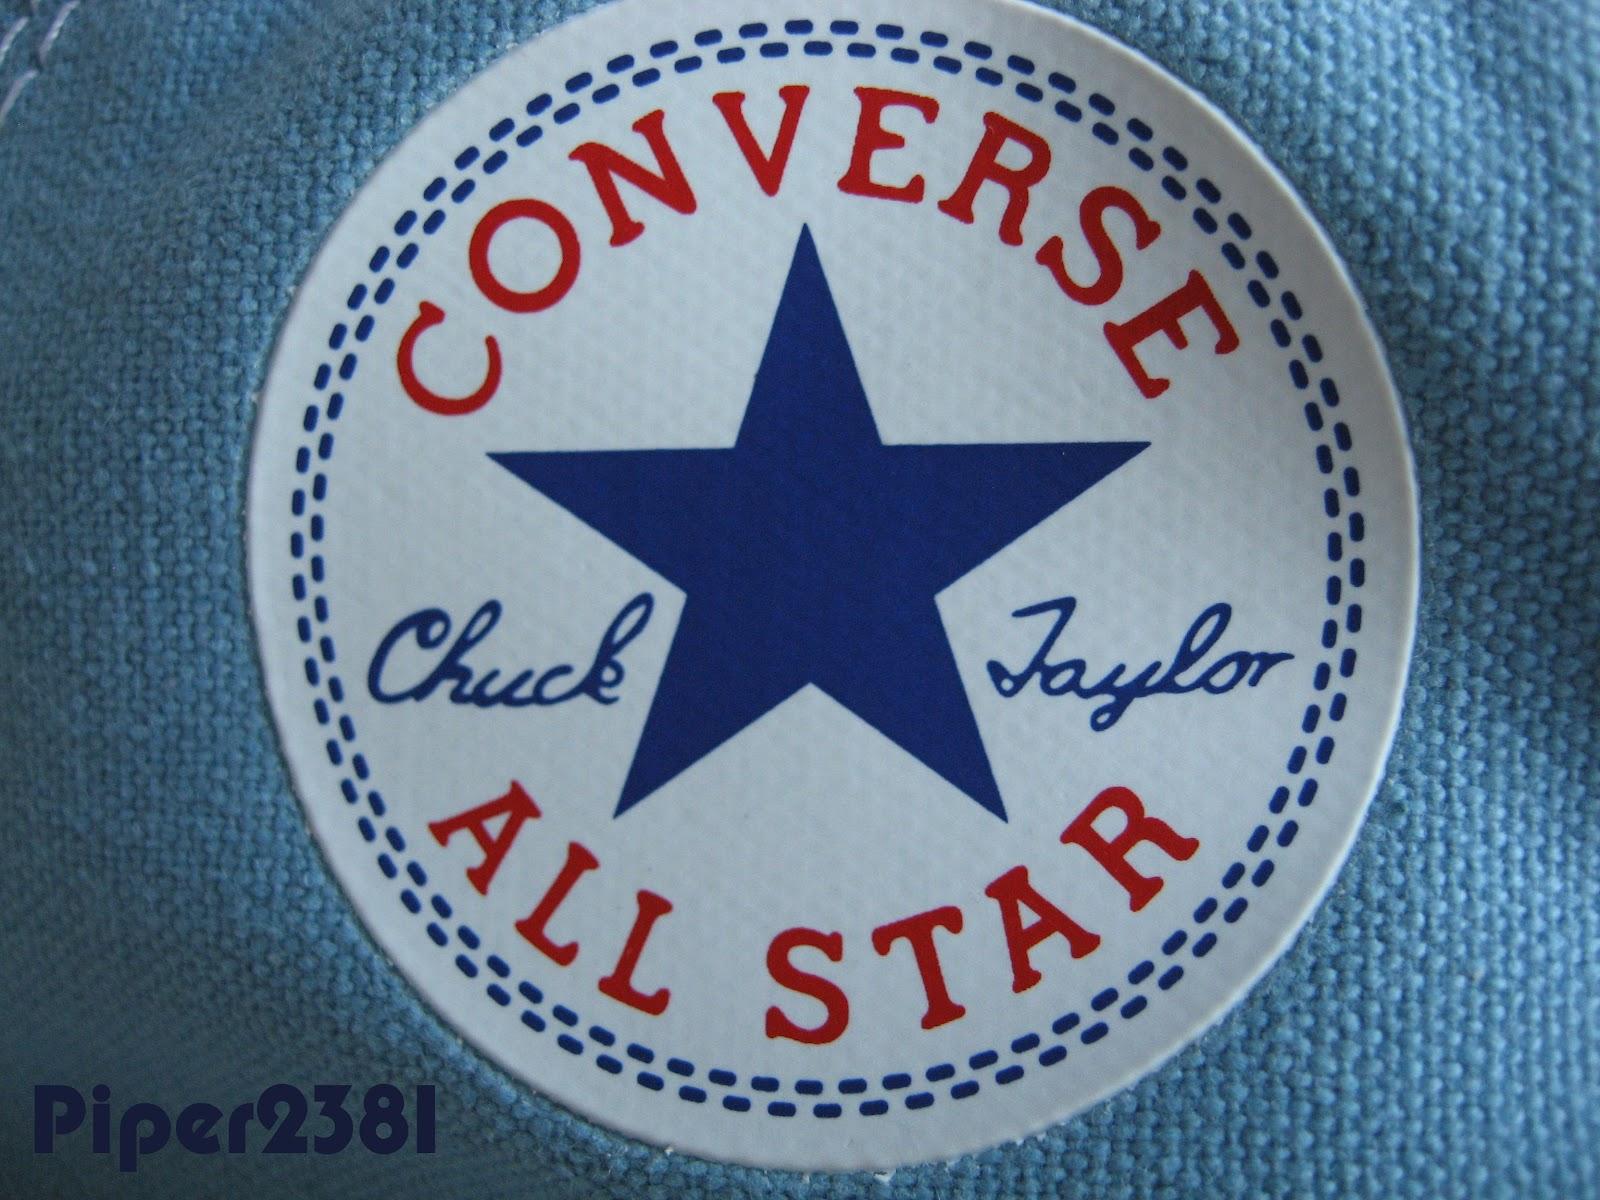 Piper2381 Converse All Star Chuck Taylor